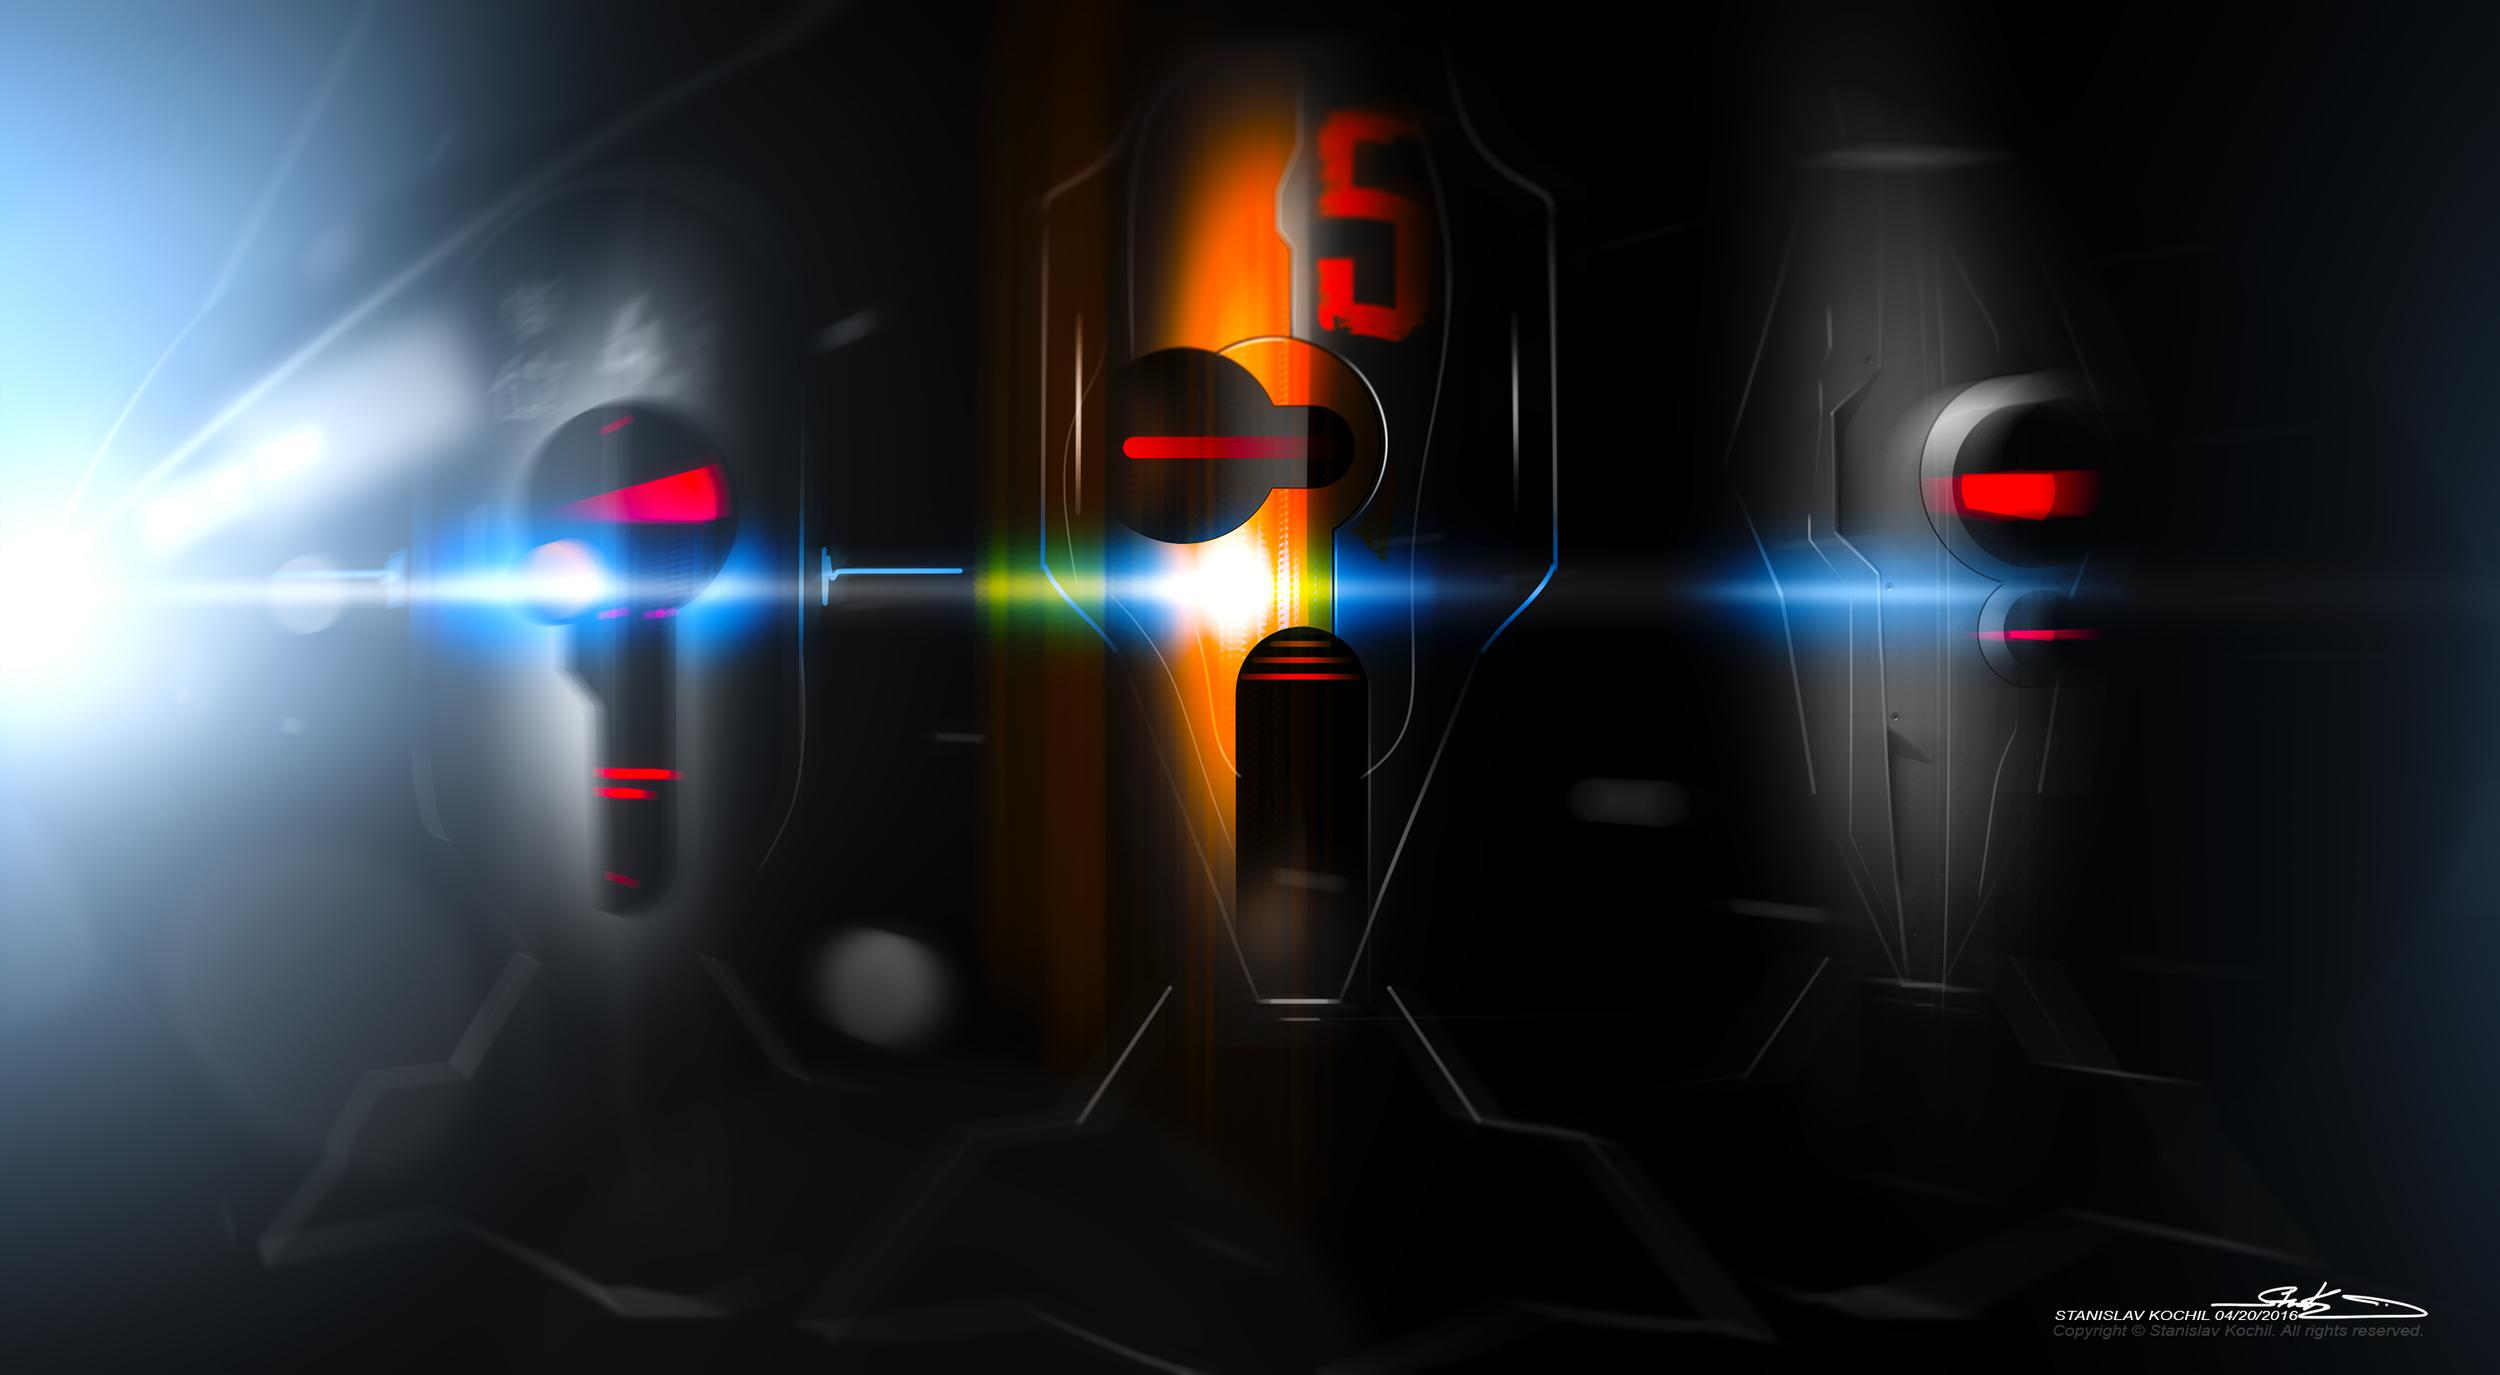 Robo_150.jpg